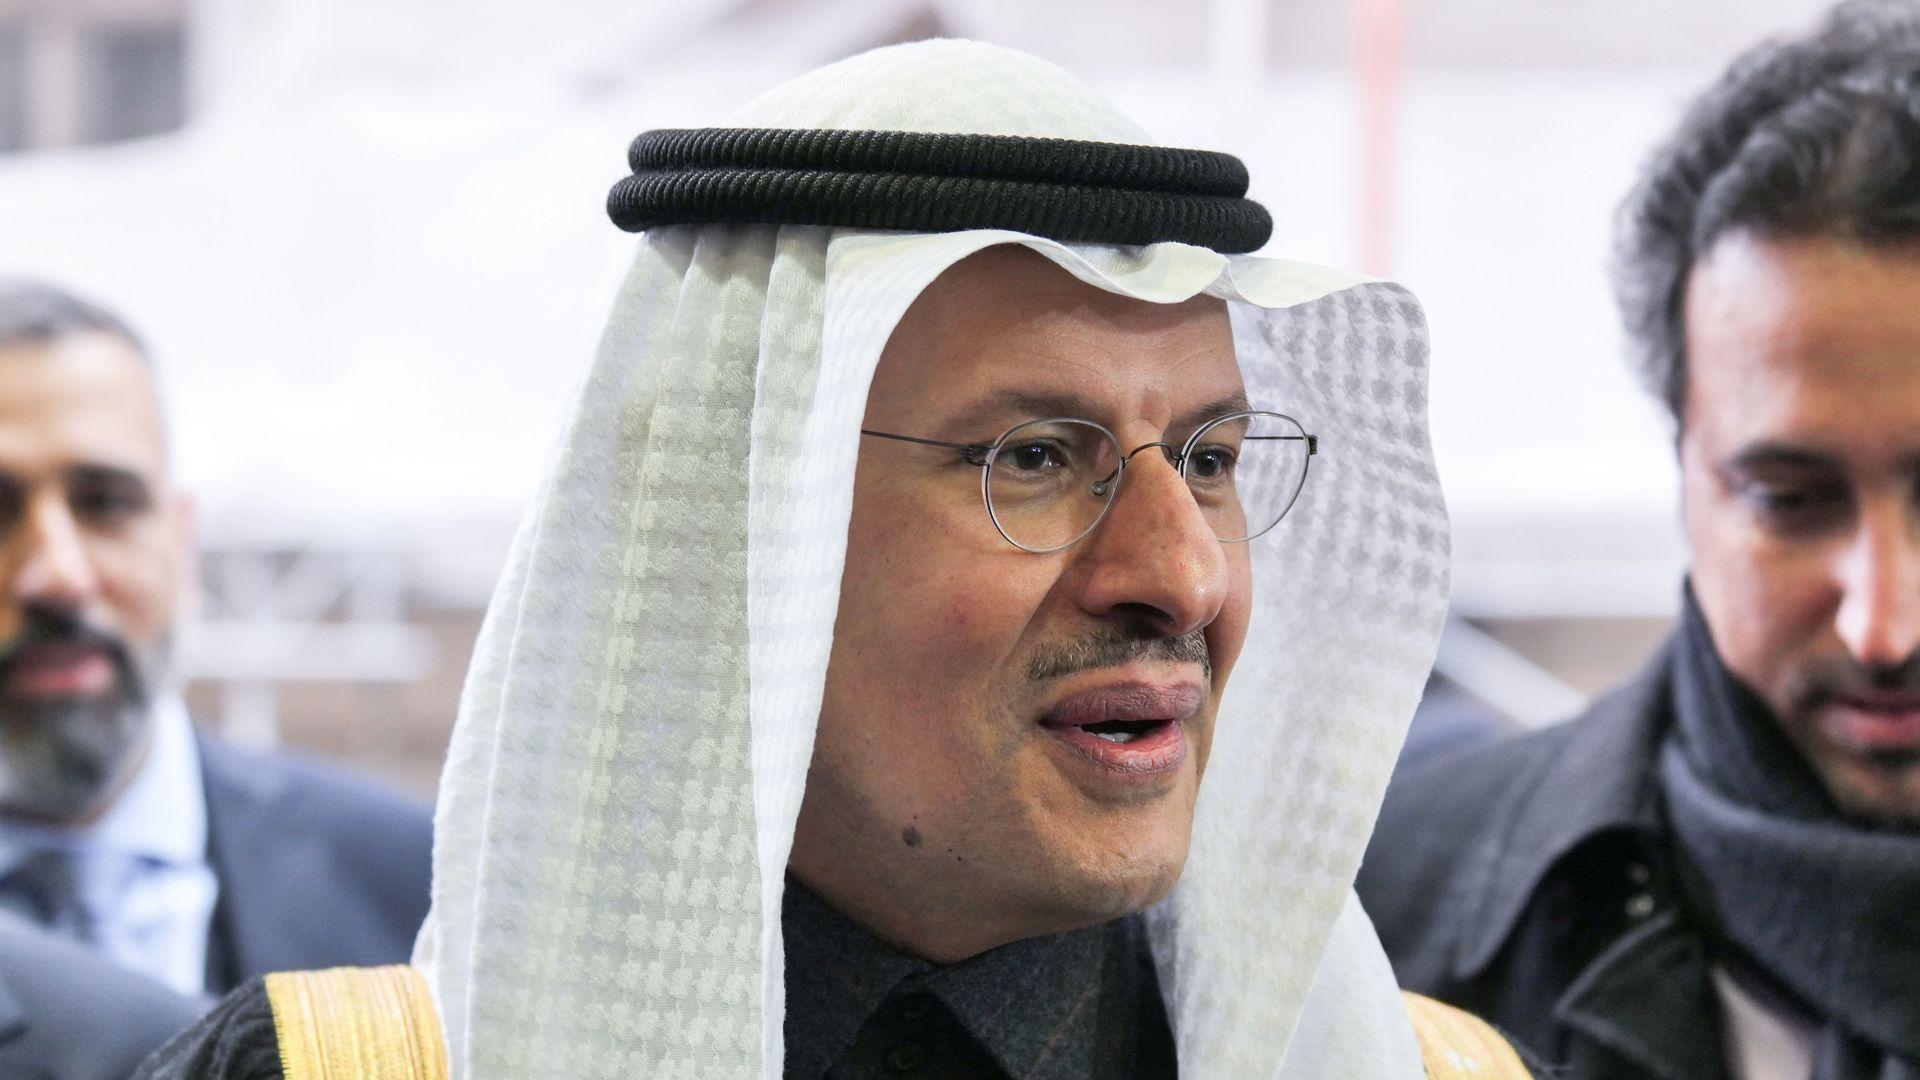 Saudi Minister of Energy Prince Abdulaziz bin Salman al-Saud